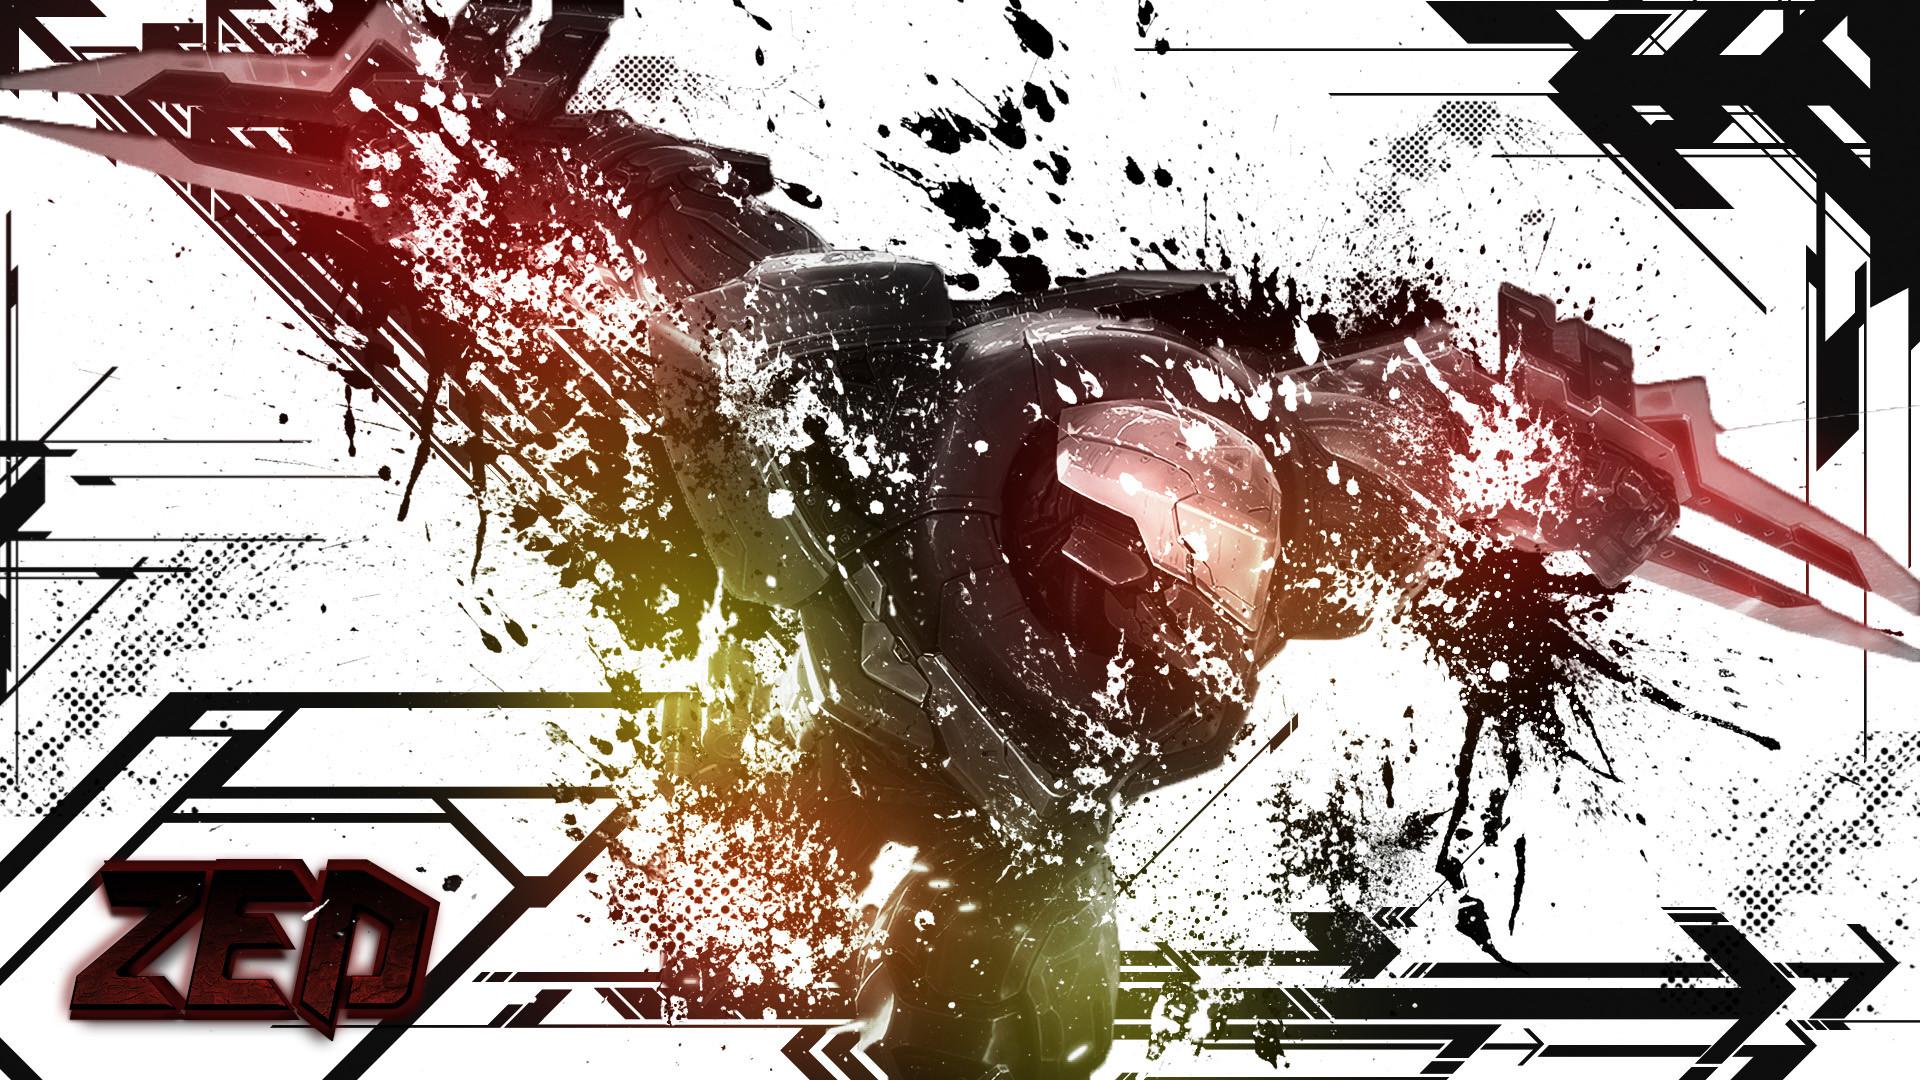 Project Zed Wallpaper by xsurfspyx Project Zed Wallpaper by xsurfspyx